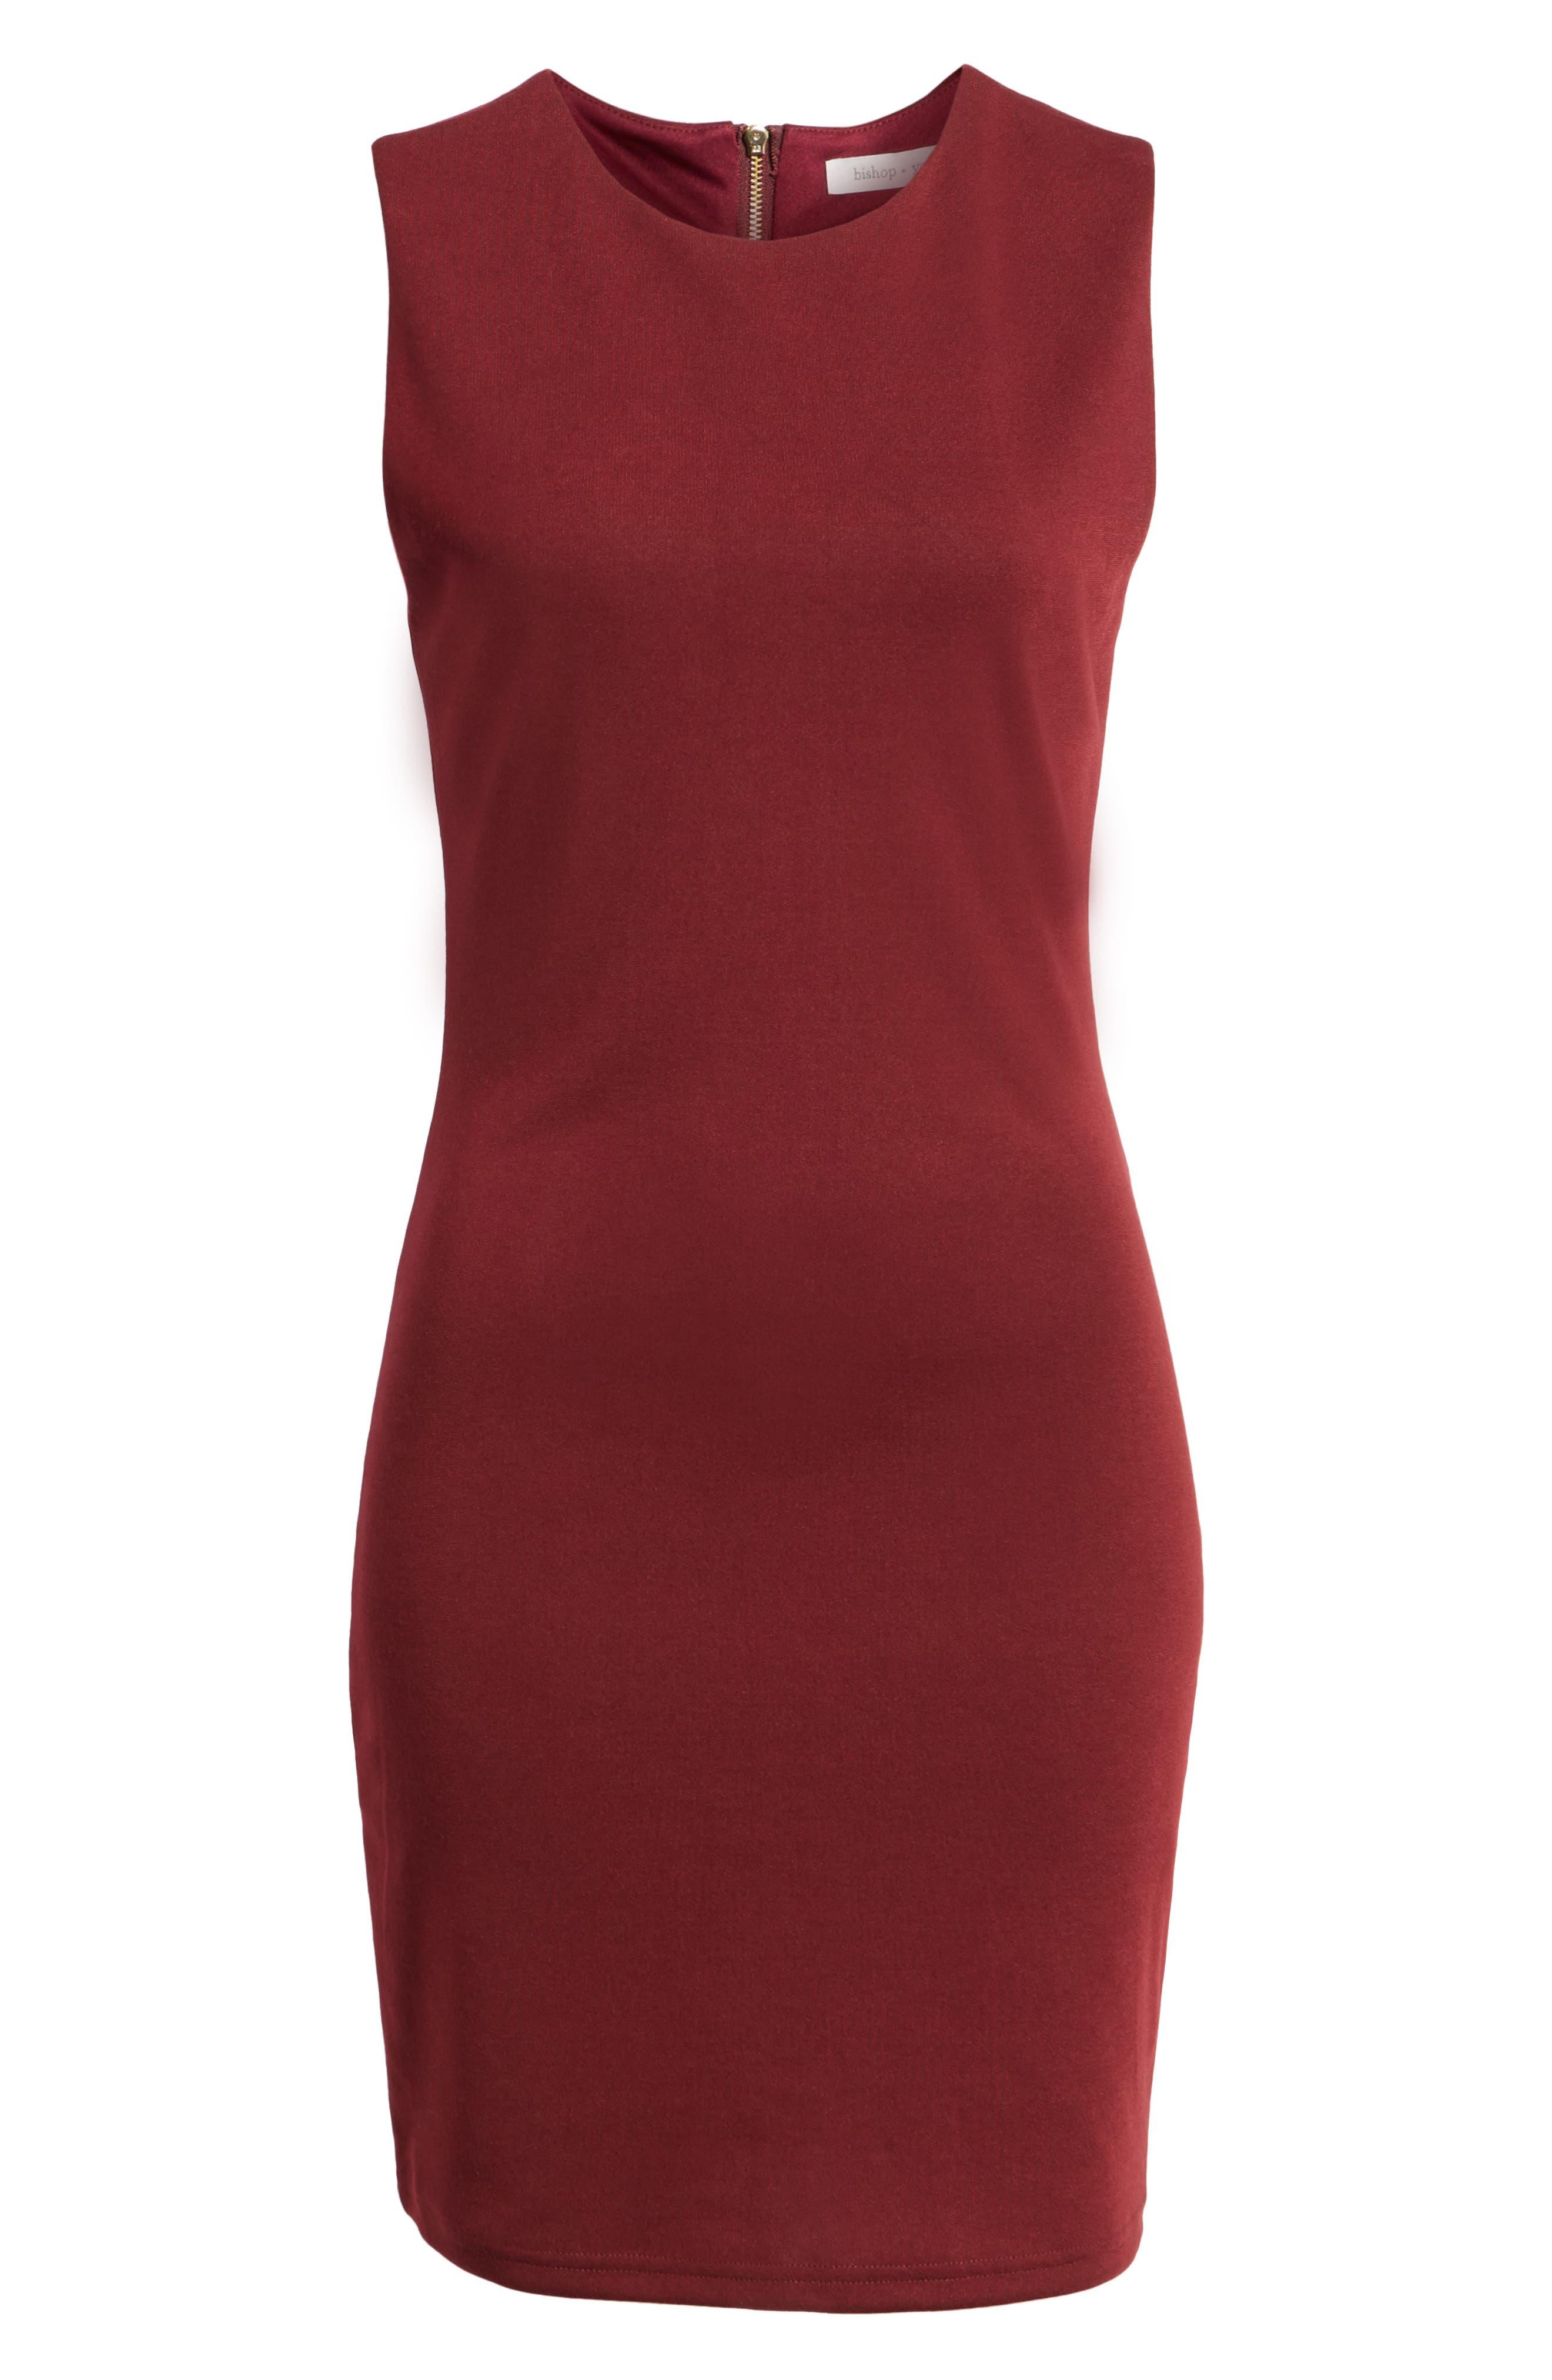 Bishop + Young Ponte Knit Sheath Dress,                             Alternate thumbnail 6, color,                             Burgundy